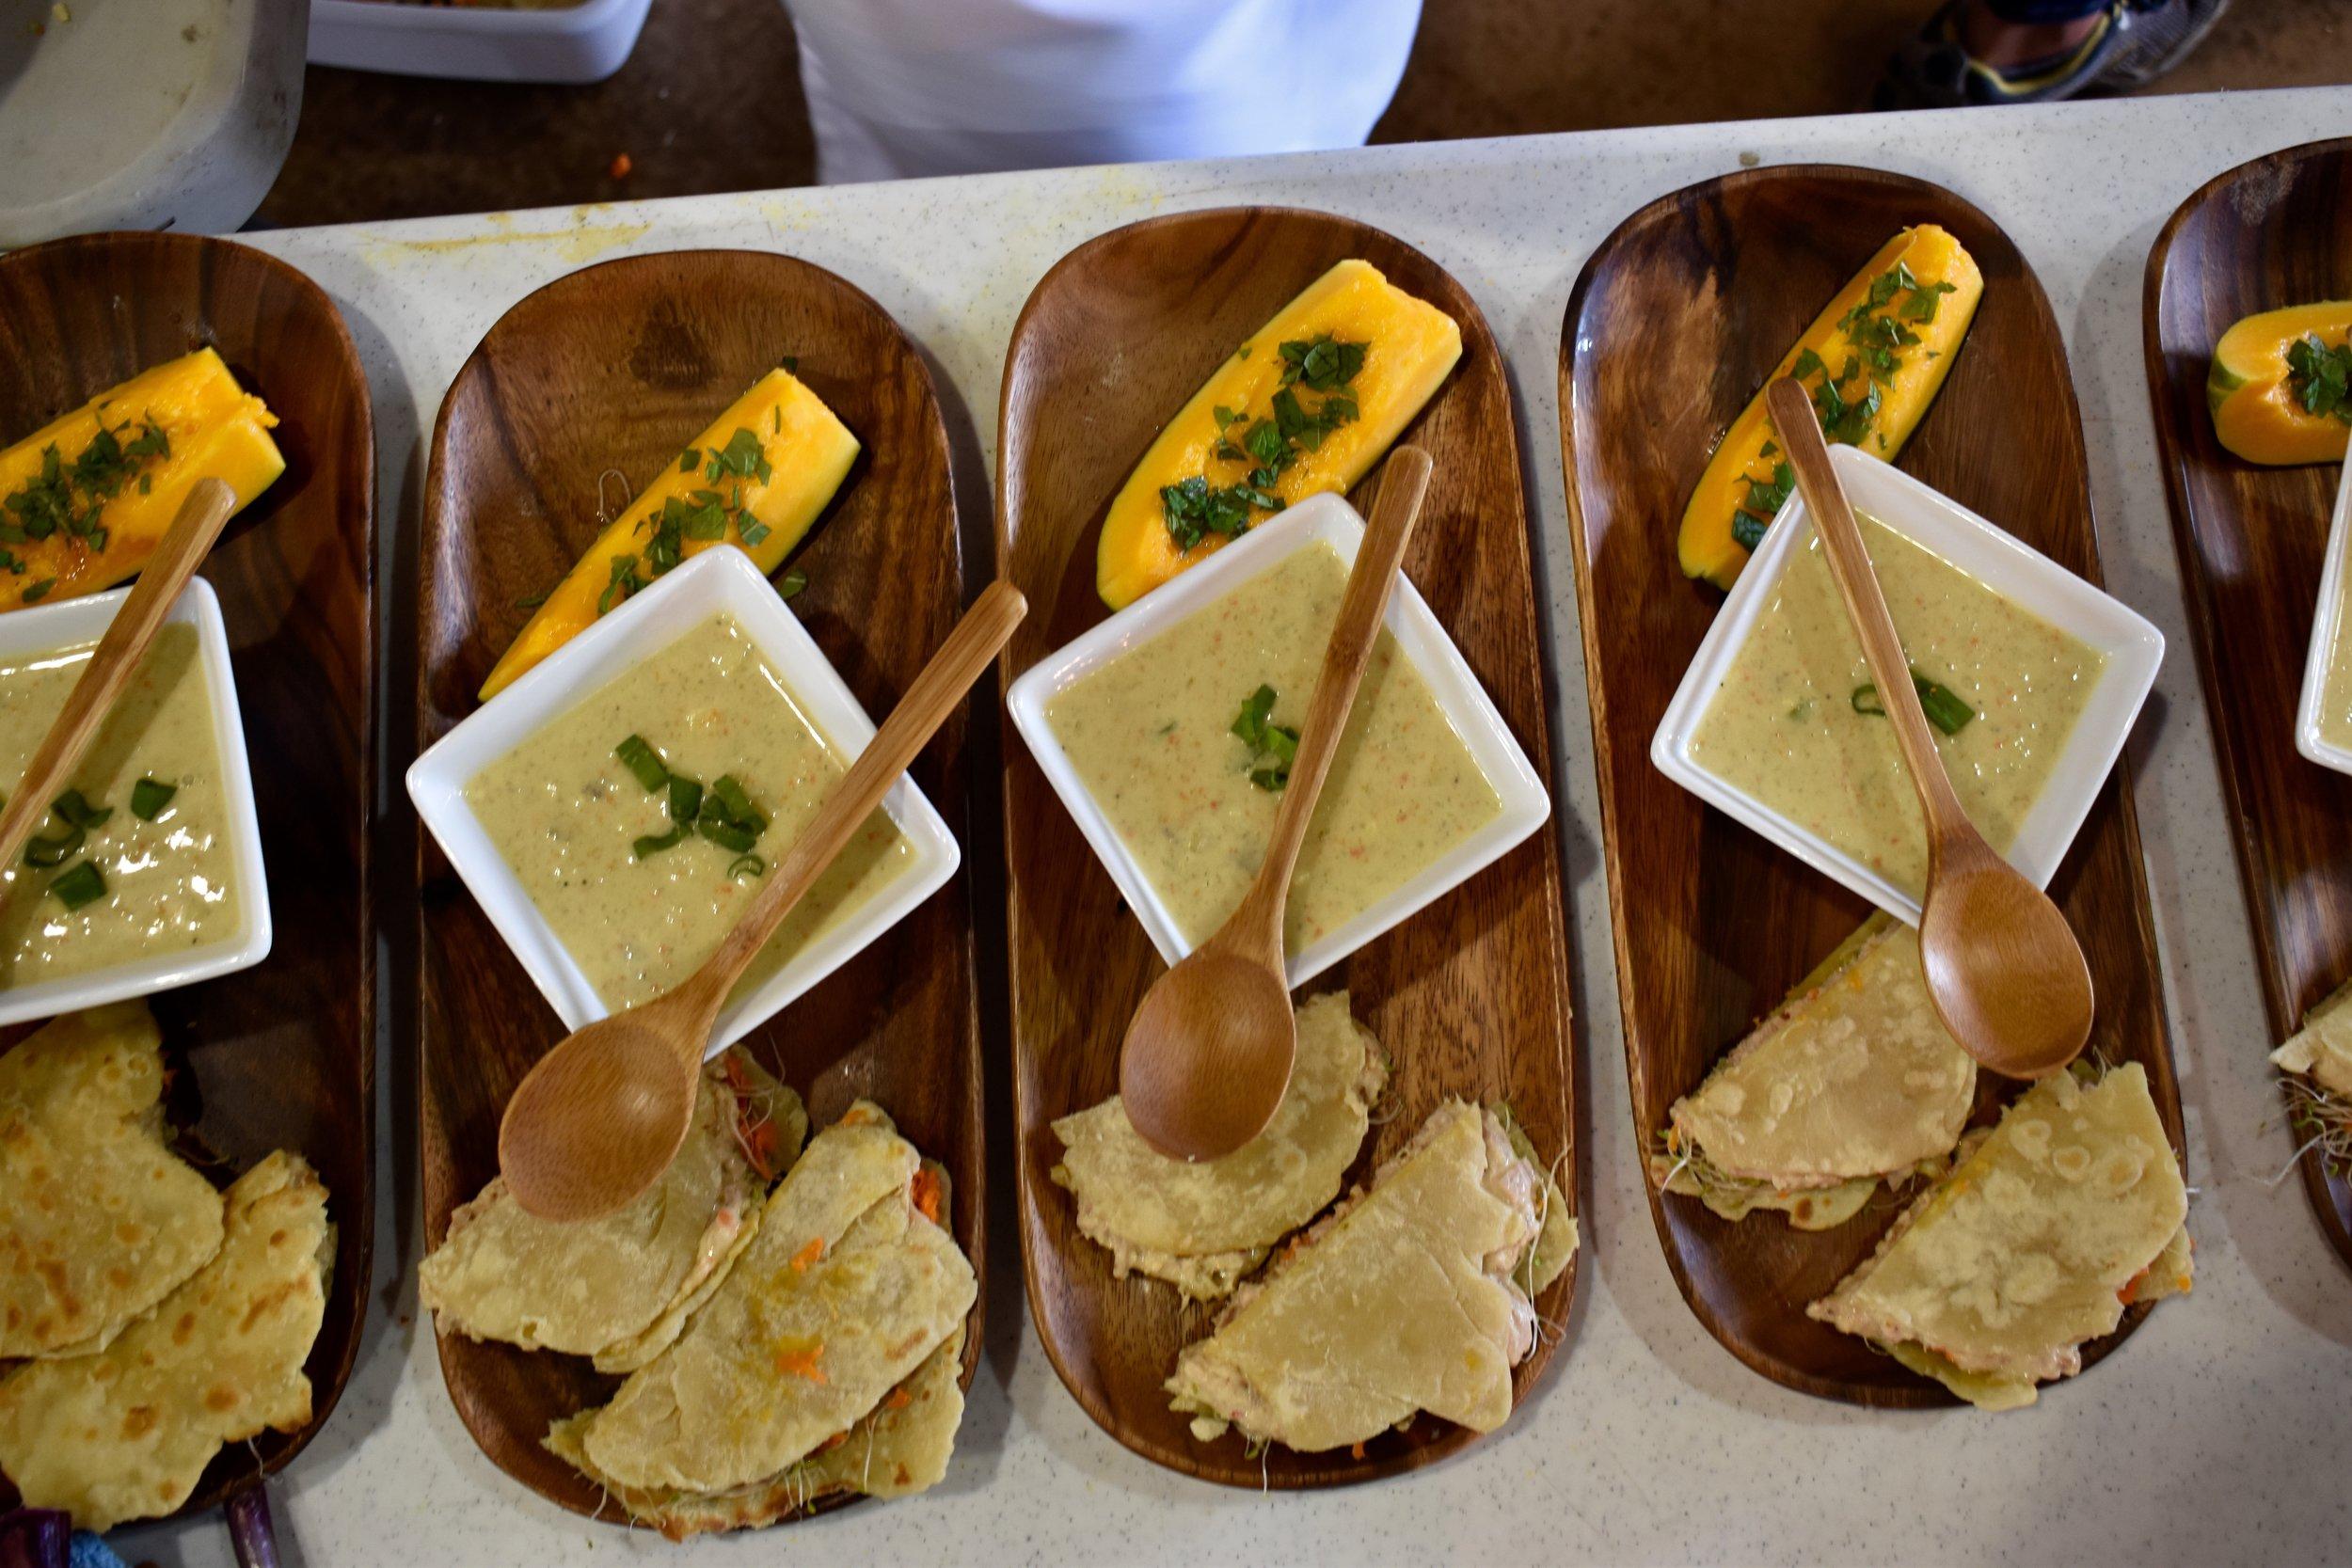 Salmon and Tuna Salad on Homemade Flatbread - With Corn Chowder